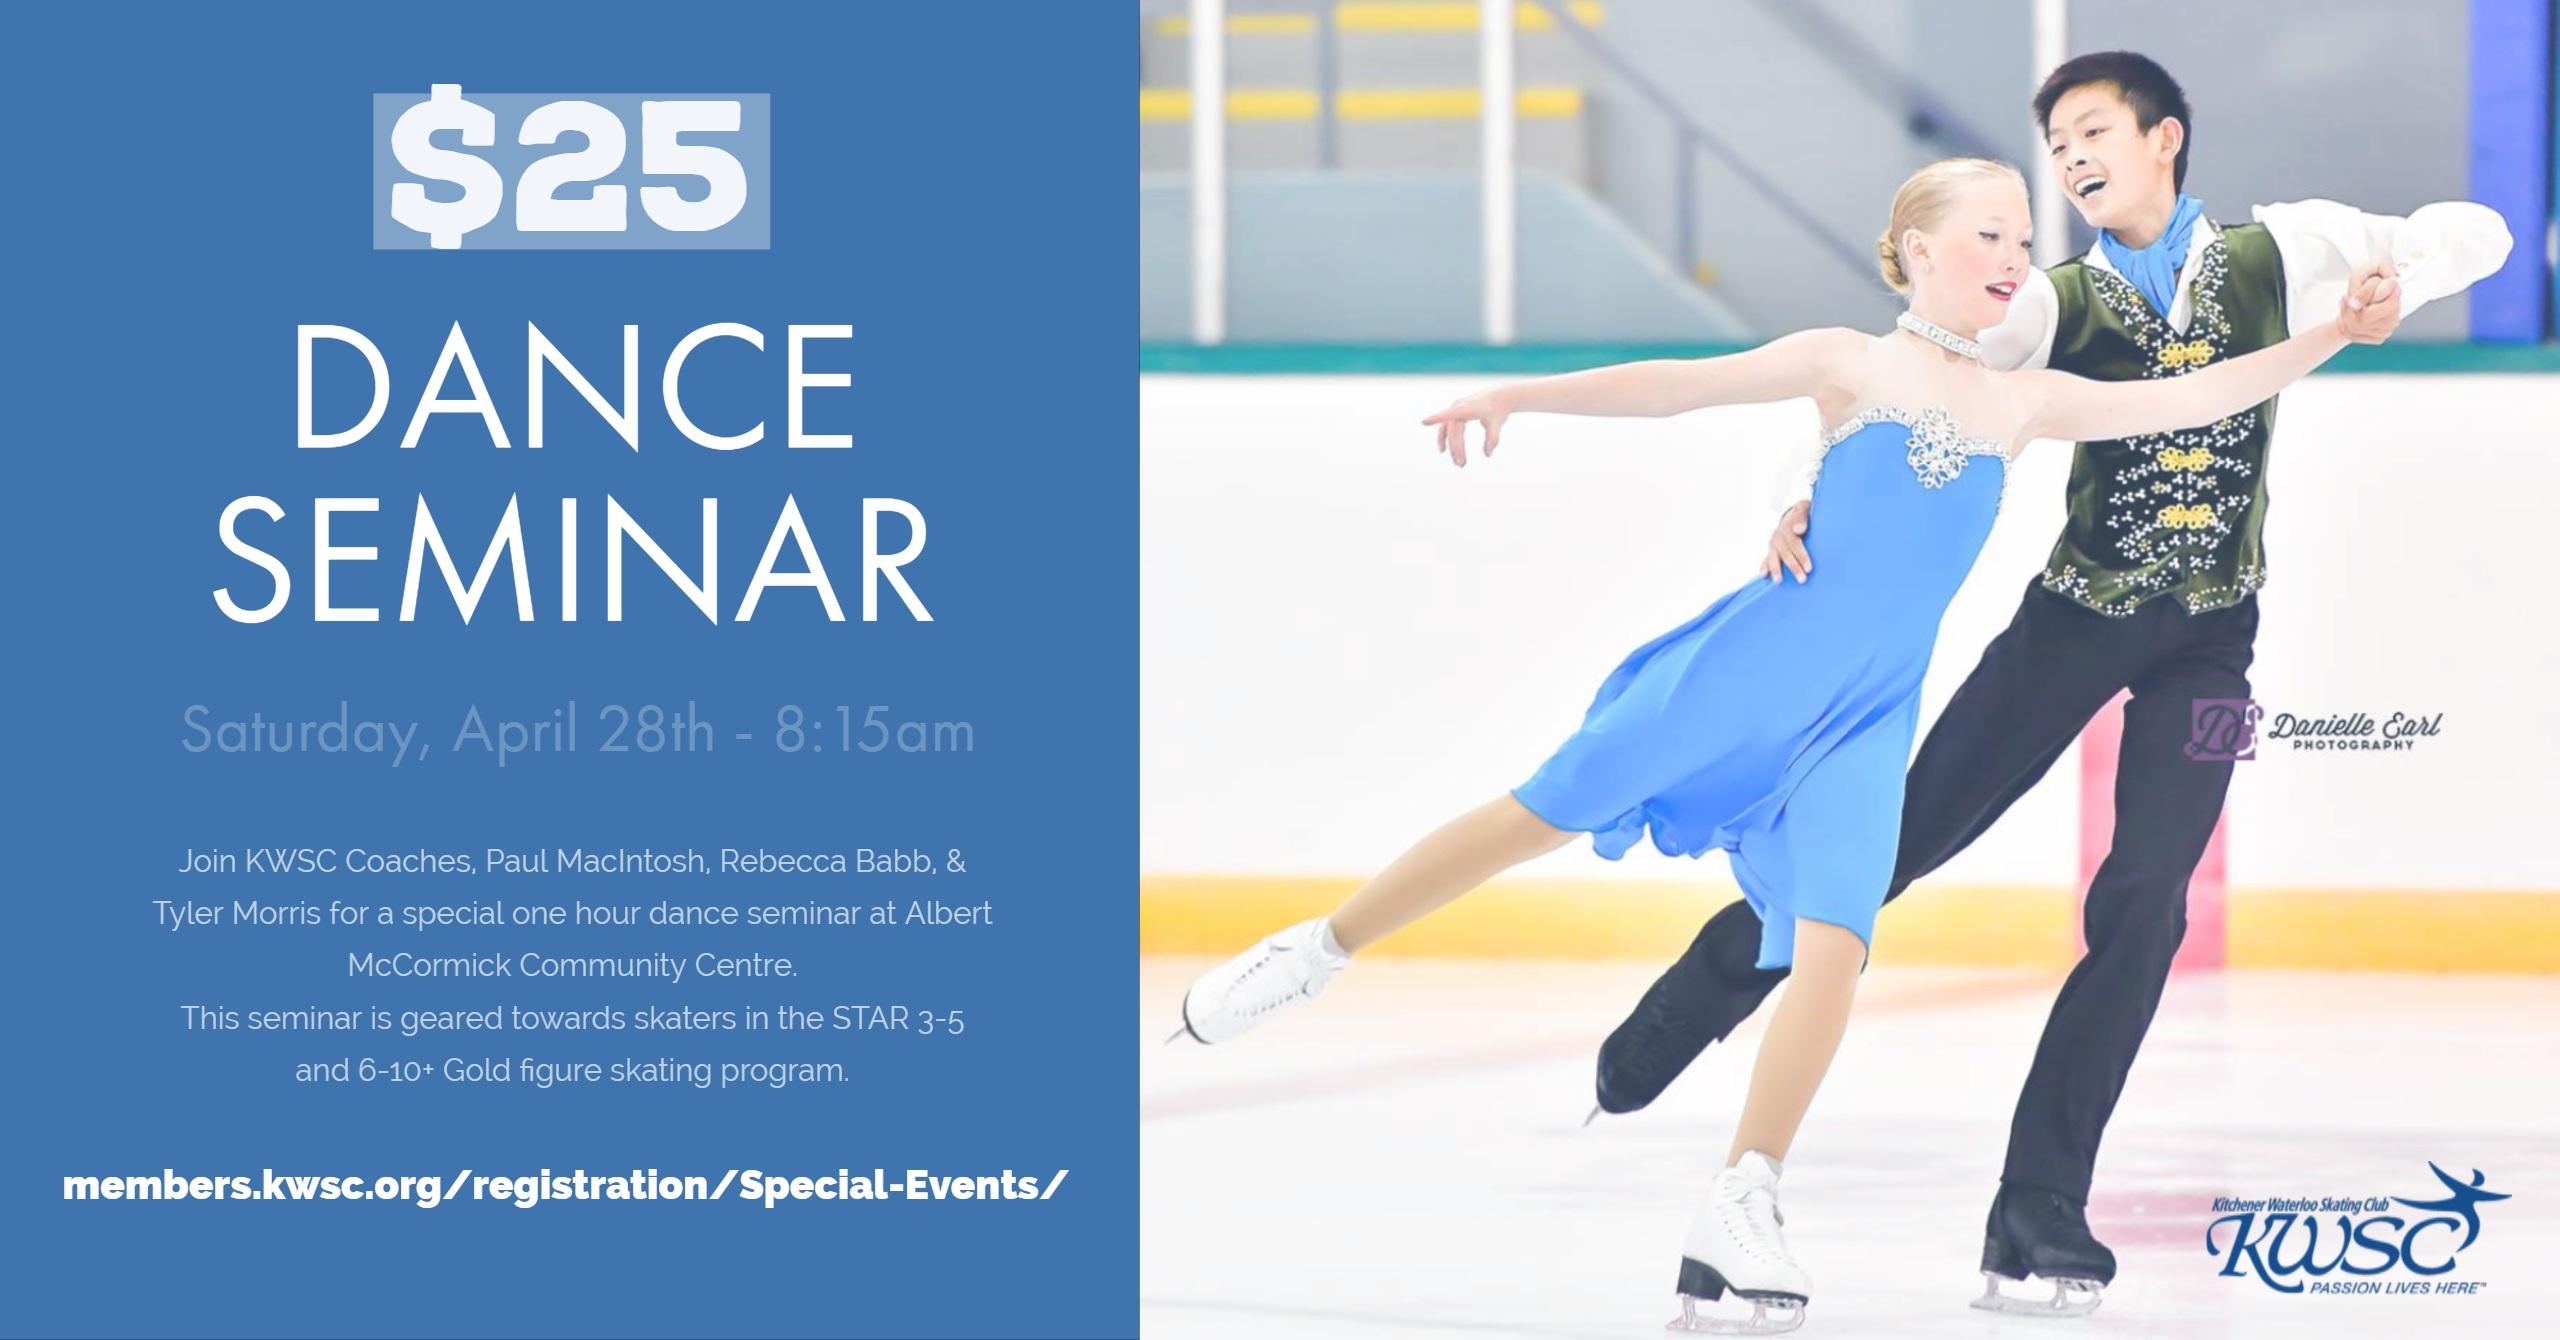 KWSC Dance Seminar - April 28th